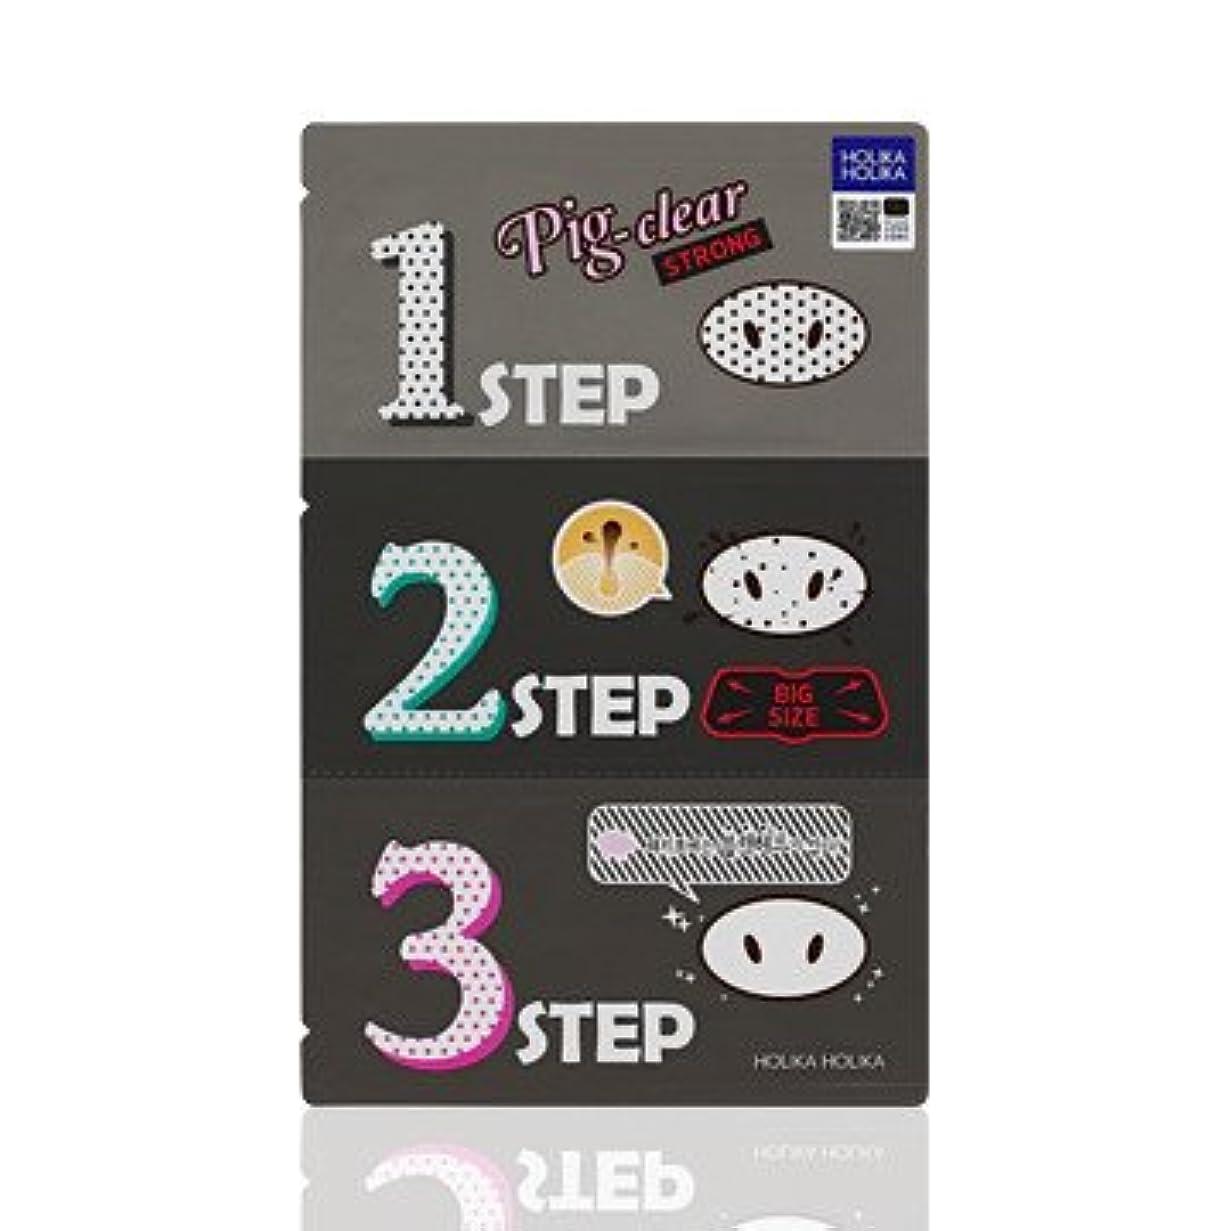 自体強化系統的Holika Holika Pig Nose Clear Black Head 3-Step Kit 5EA